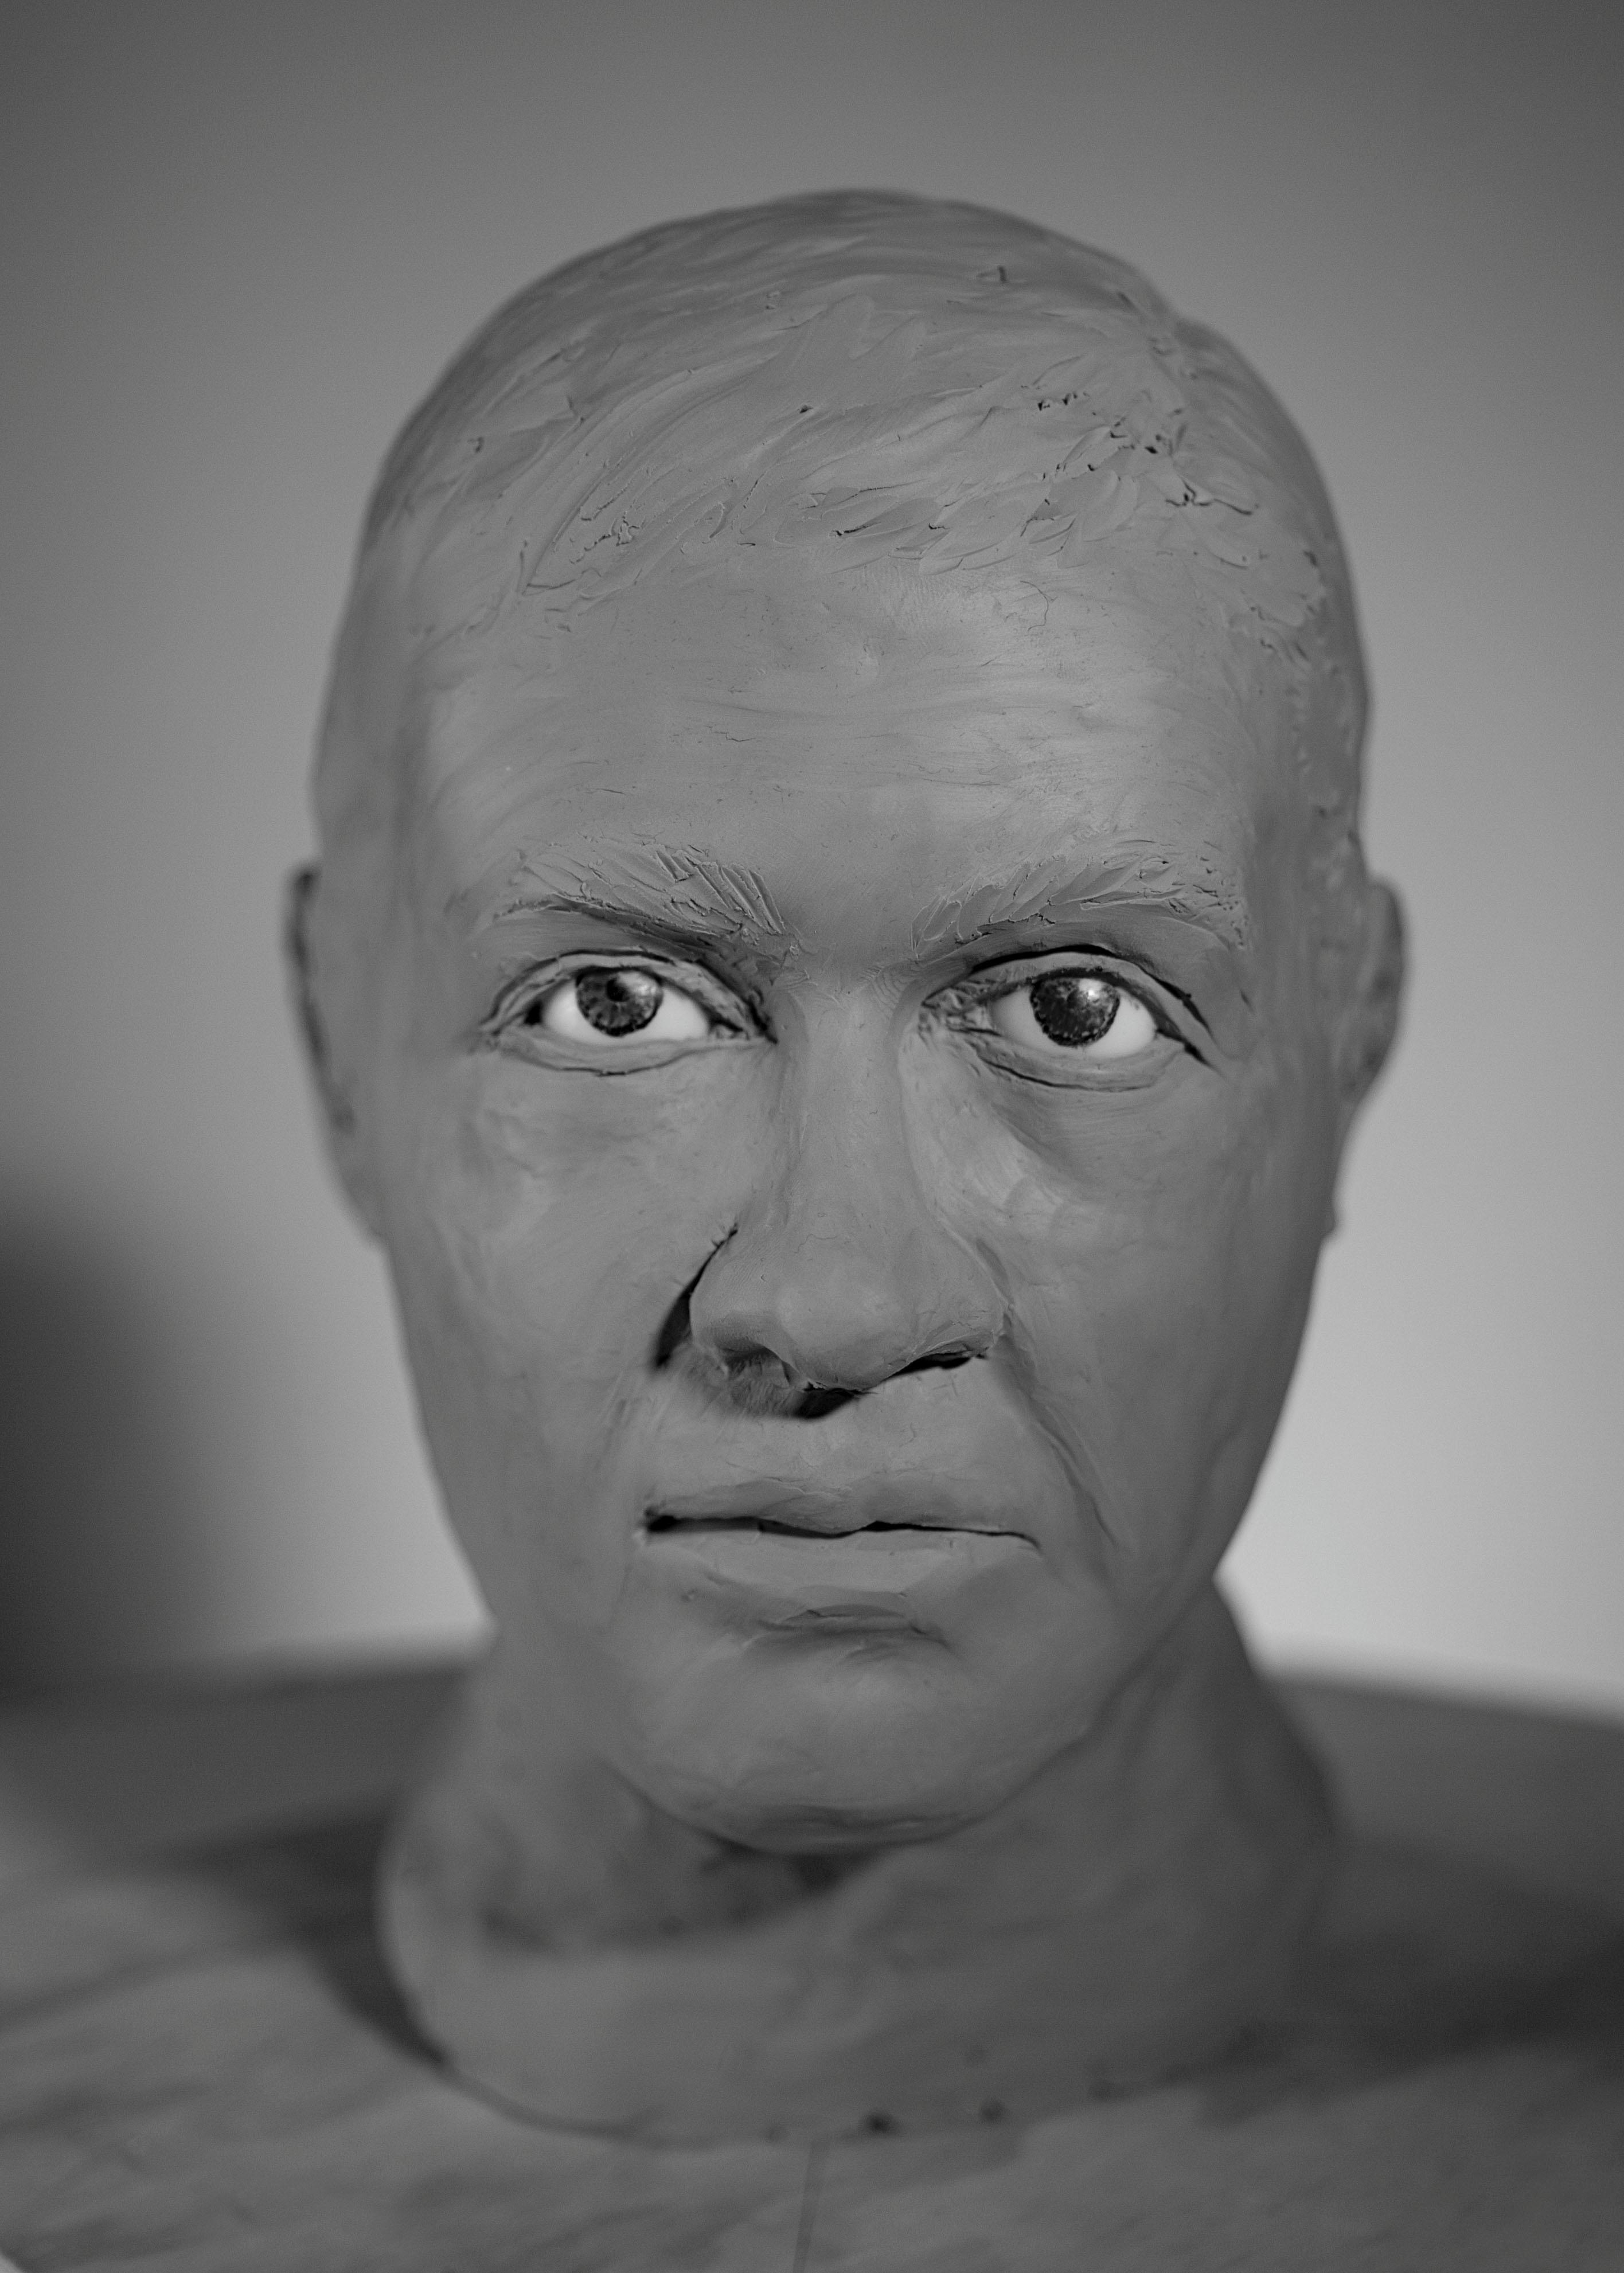 Parksville John Doe